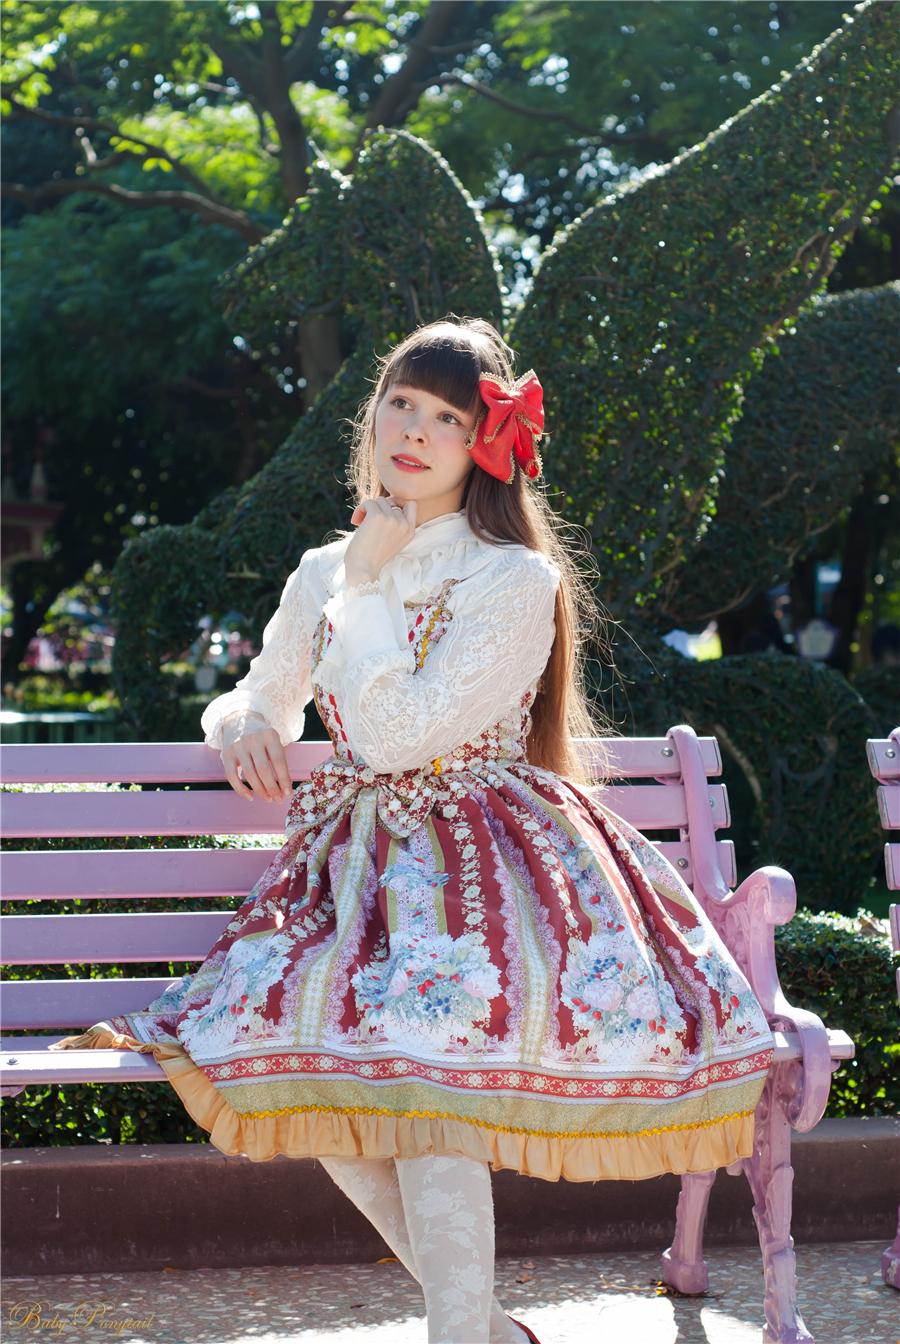 Baby Ponytail_Model Photo_Polly's Garden of Dreams_JSK Red_Claudia_9.jpg